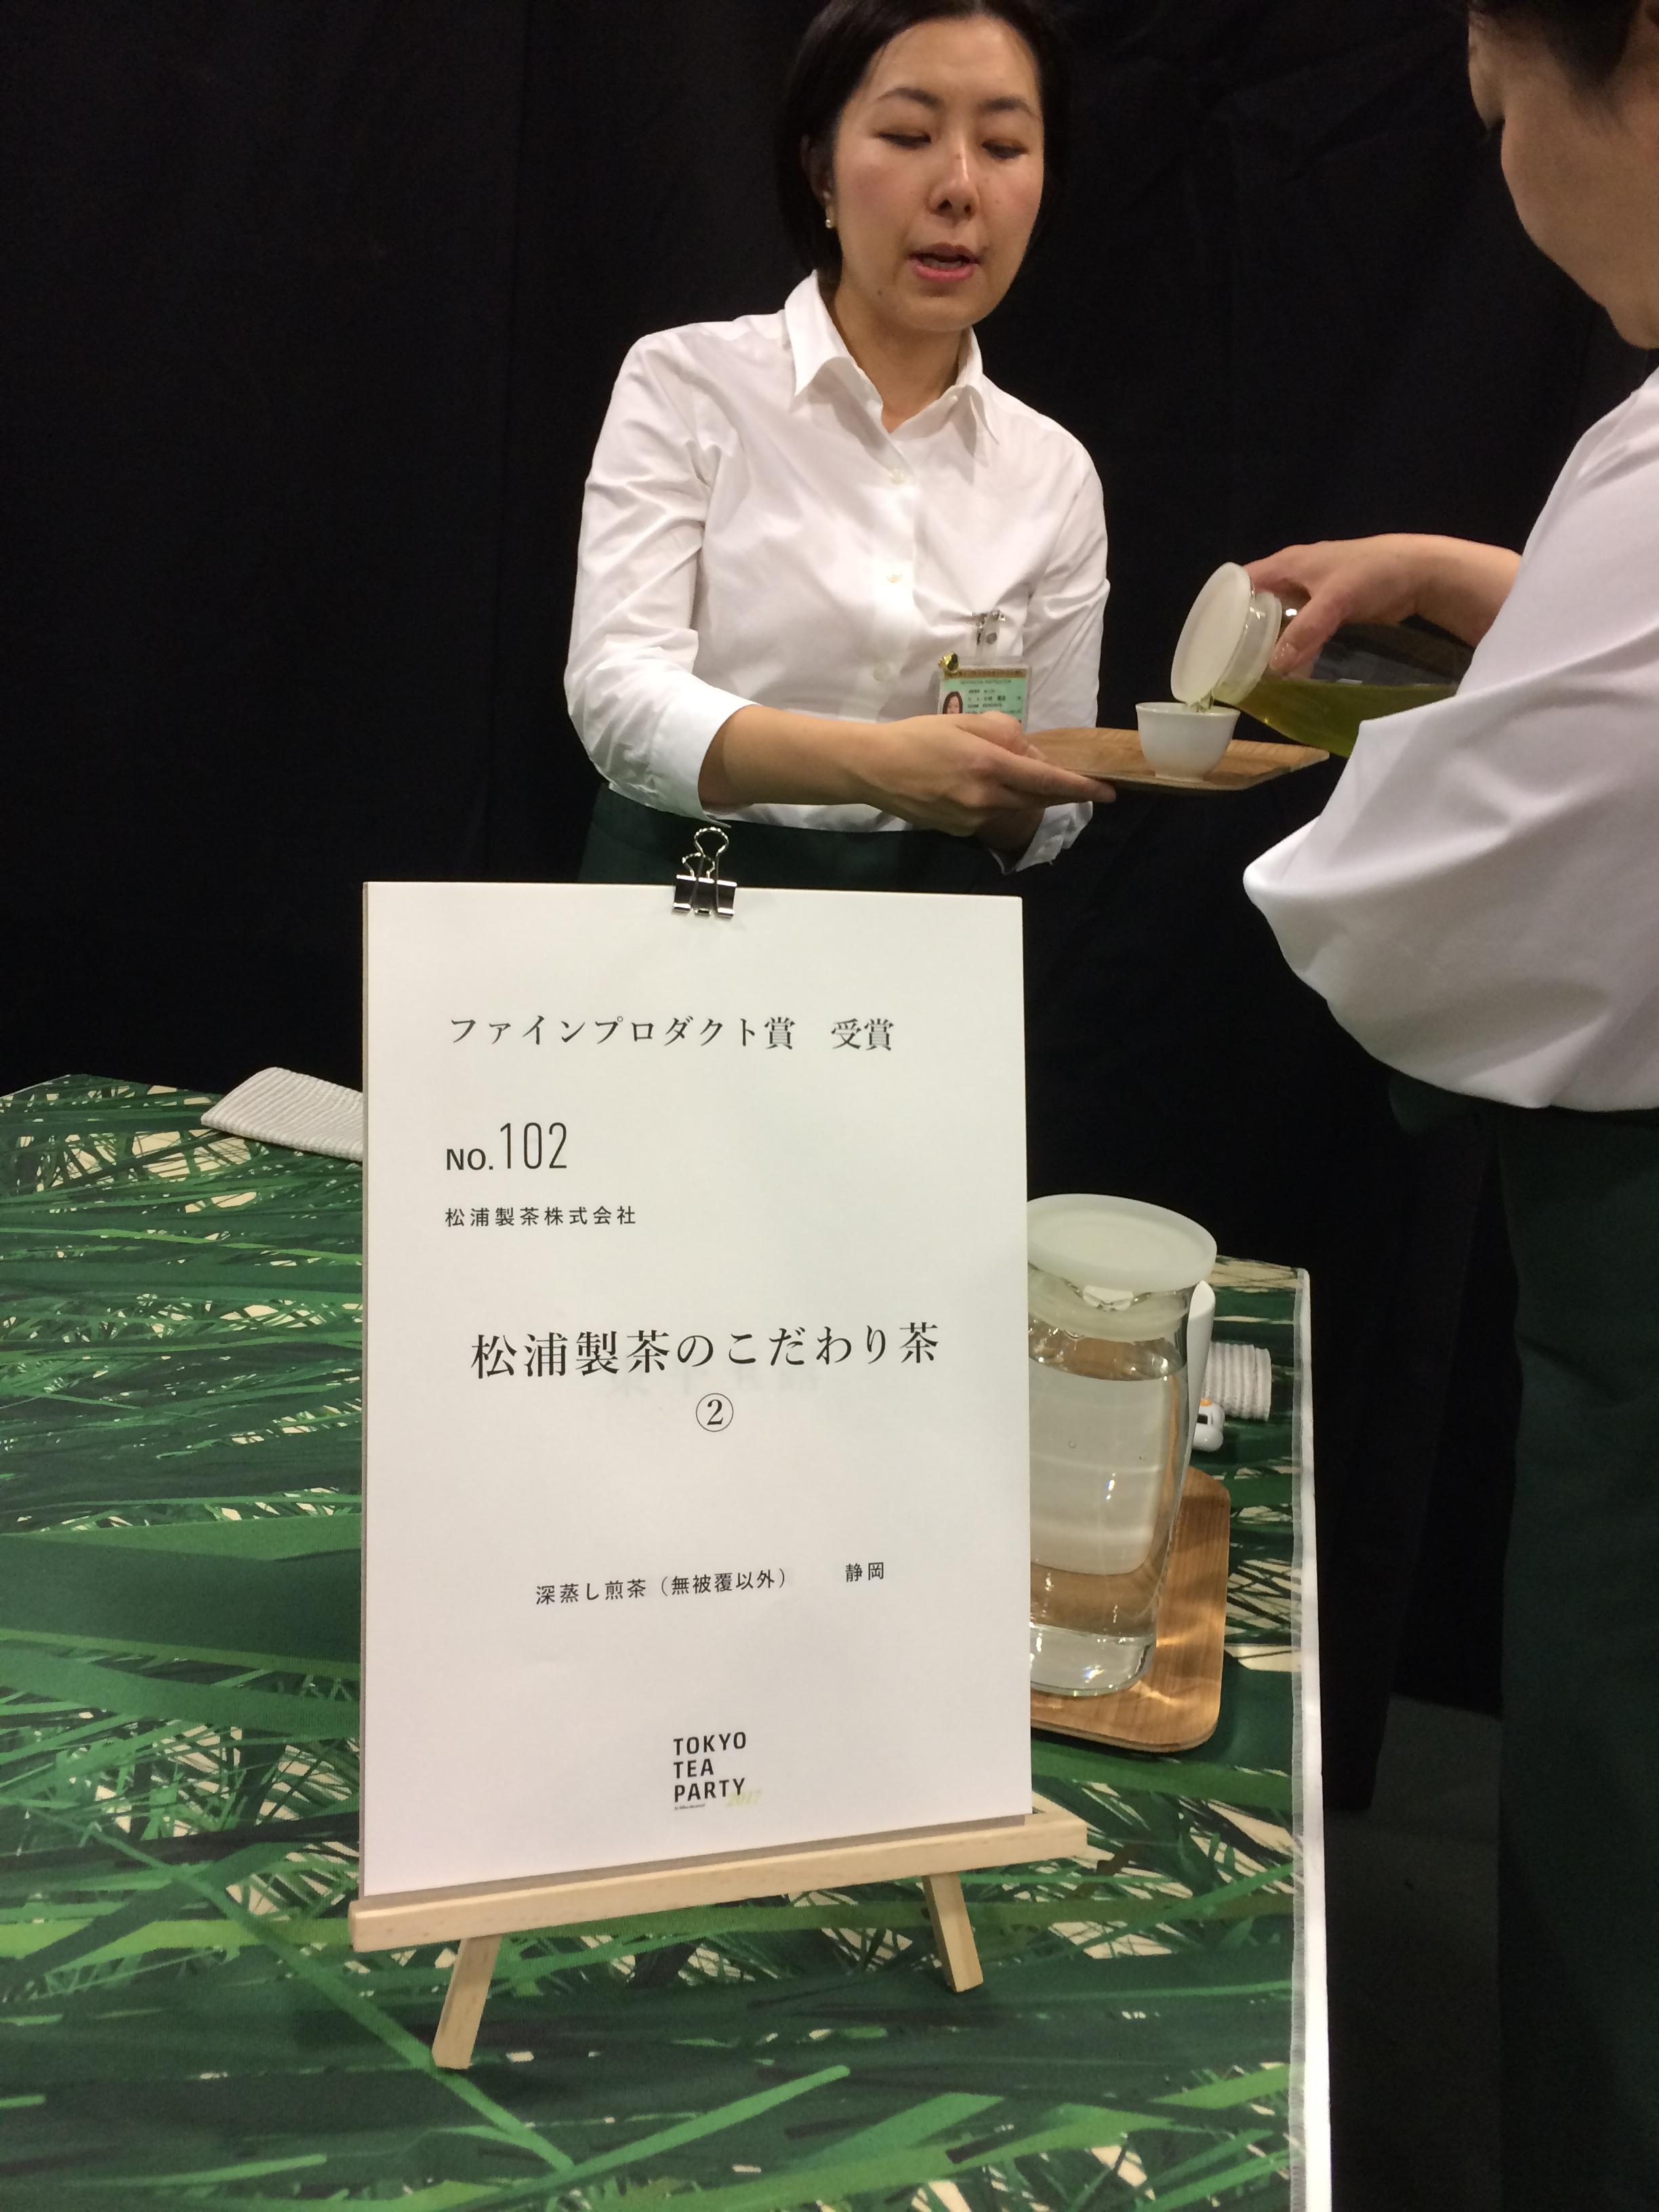 TOKYO TEA PARTY 2017